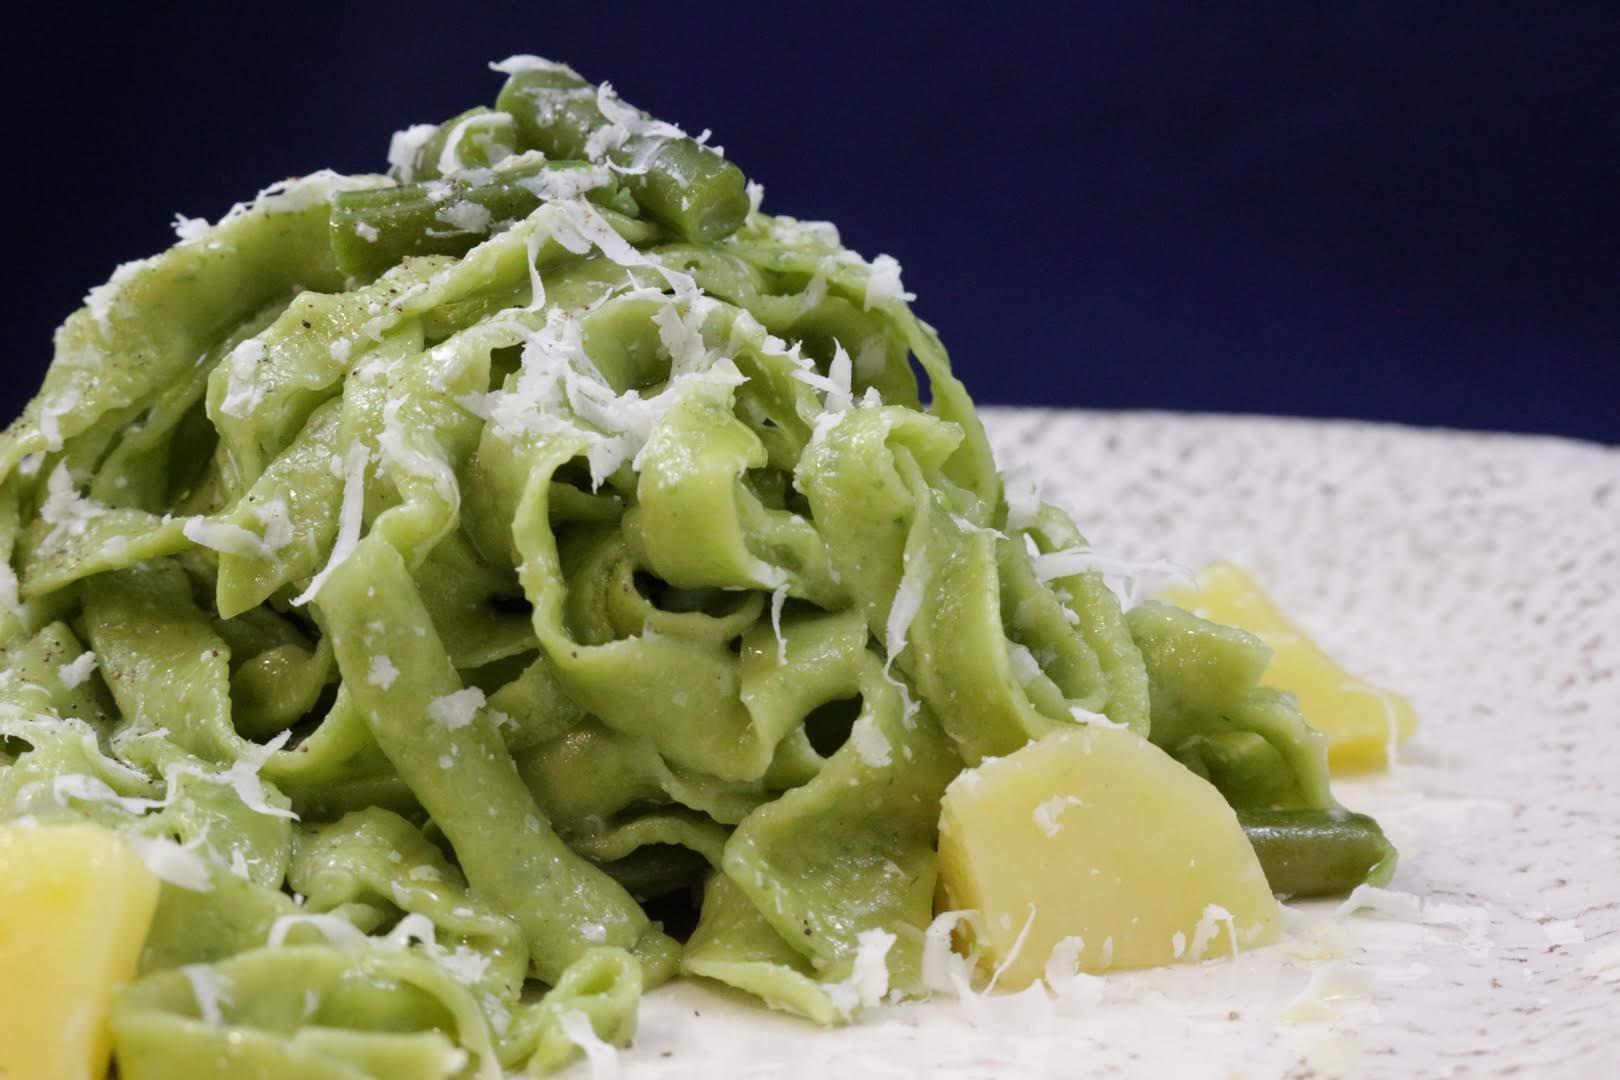 corso di cucina a torino scuola di cucina a torino corso di pasta fresca home made pasta aromi e spezie in cucina